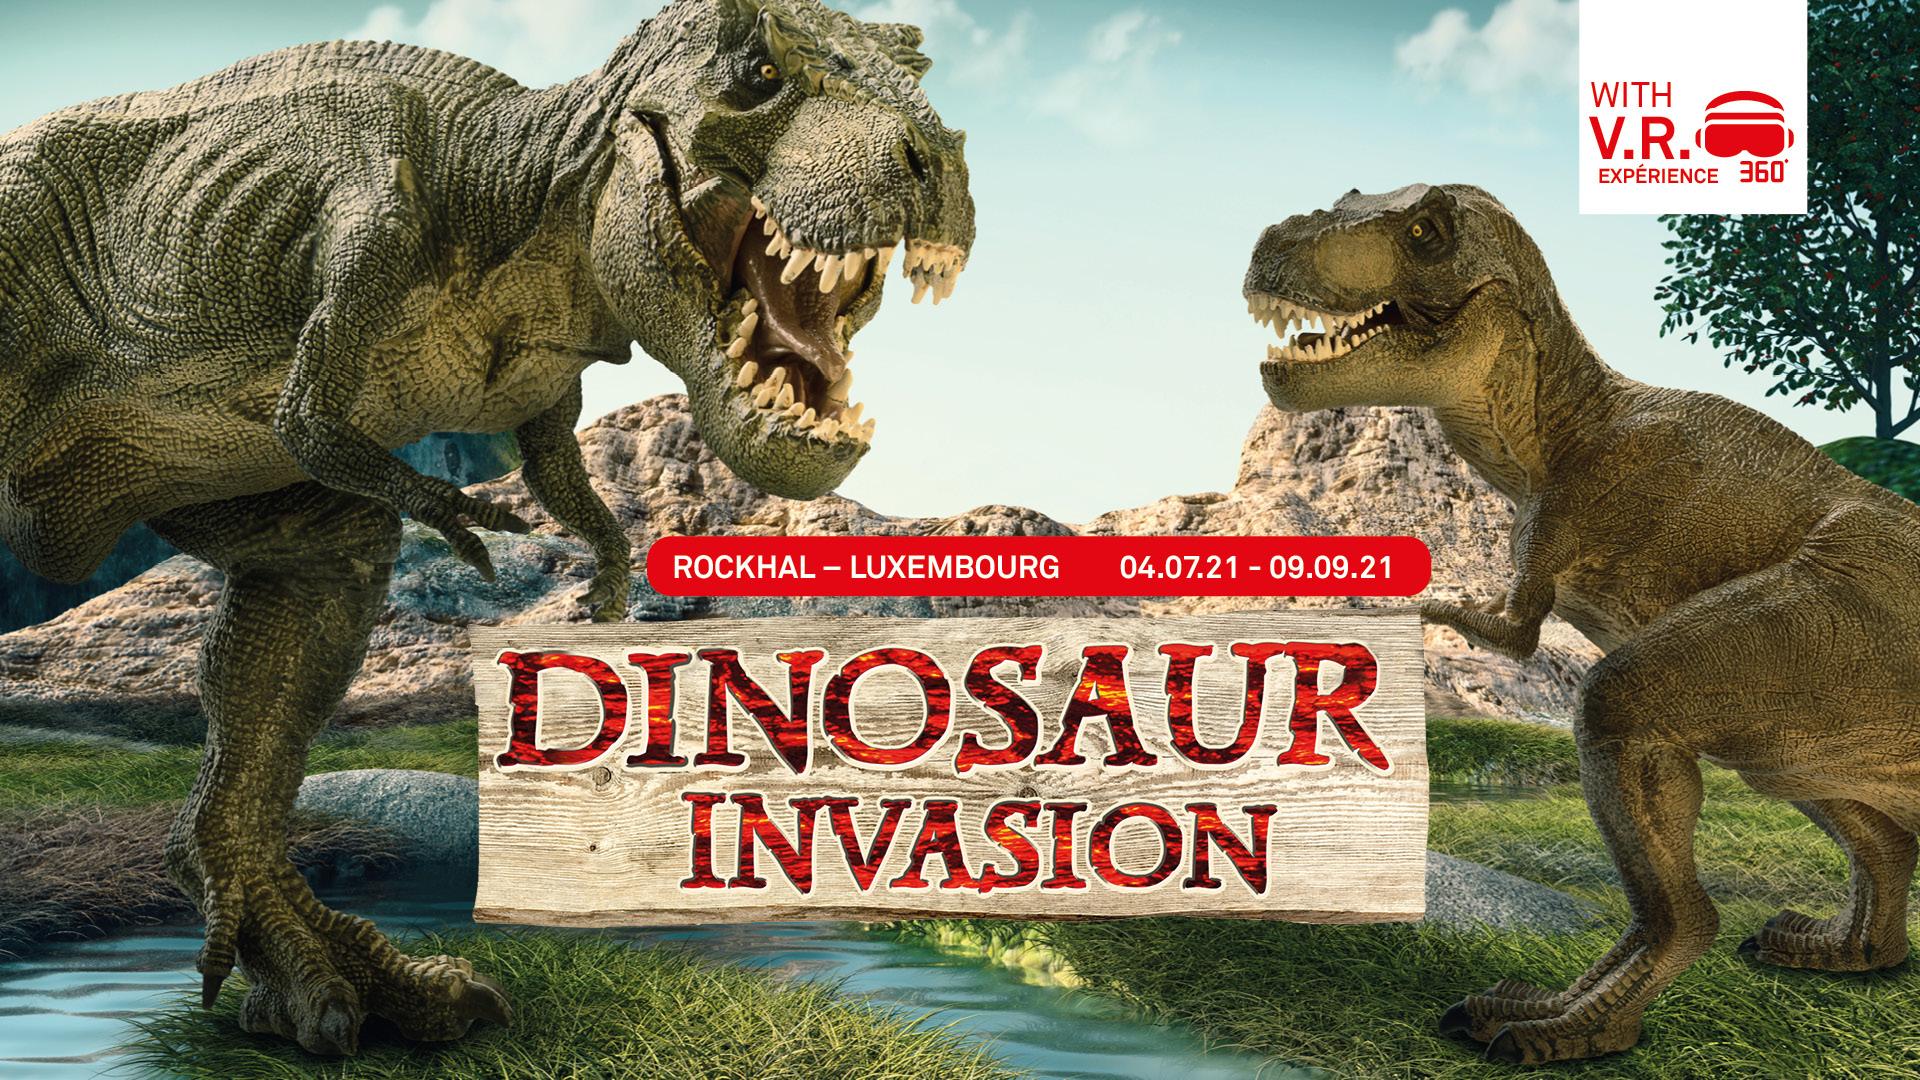 Dinosaure Invasion, Luxembourg, Rockhal, 04/07/21 - 09/09/21, VR360°